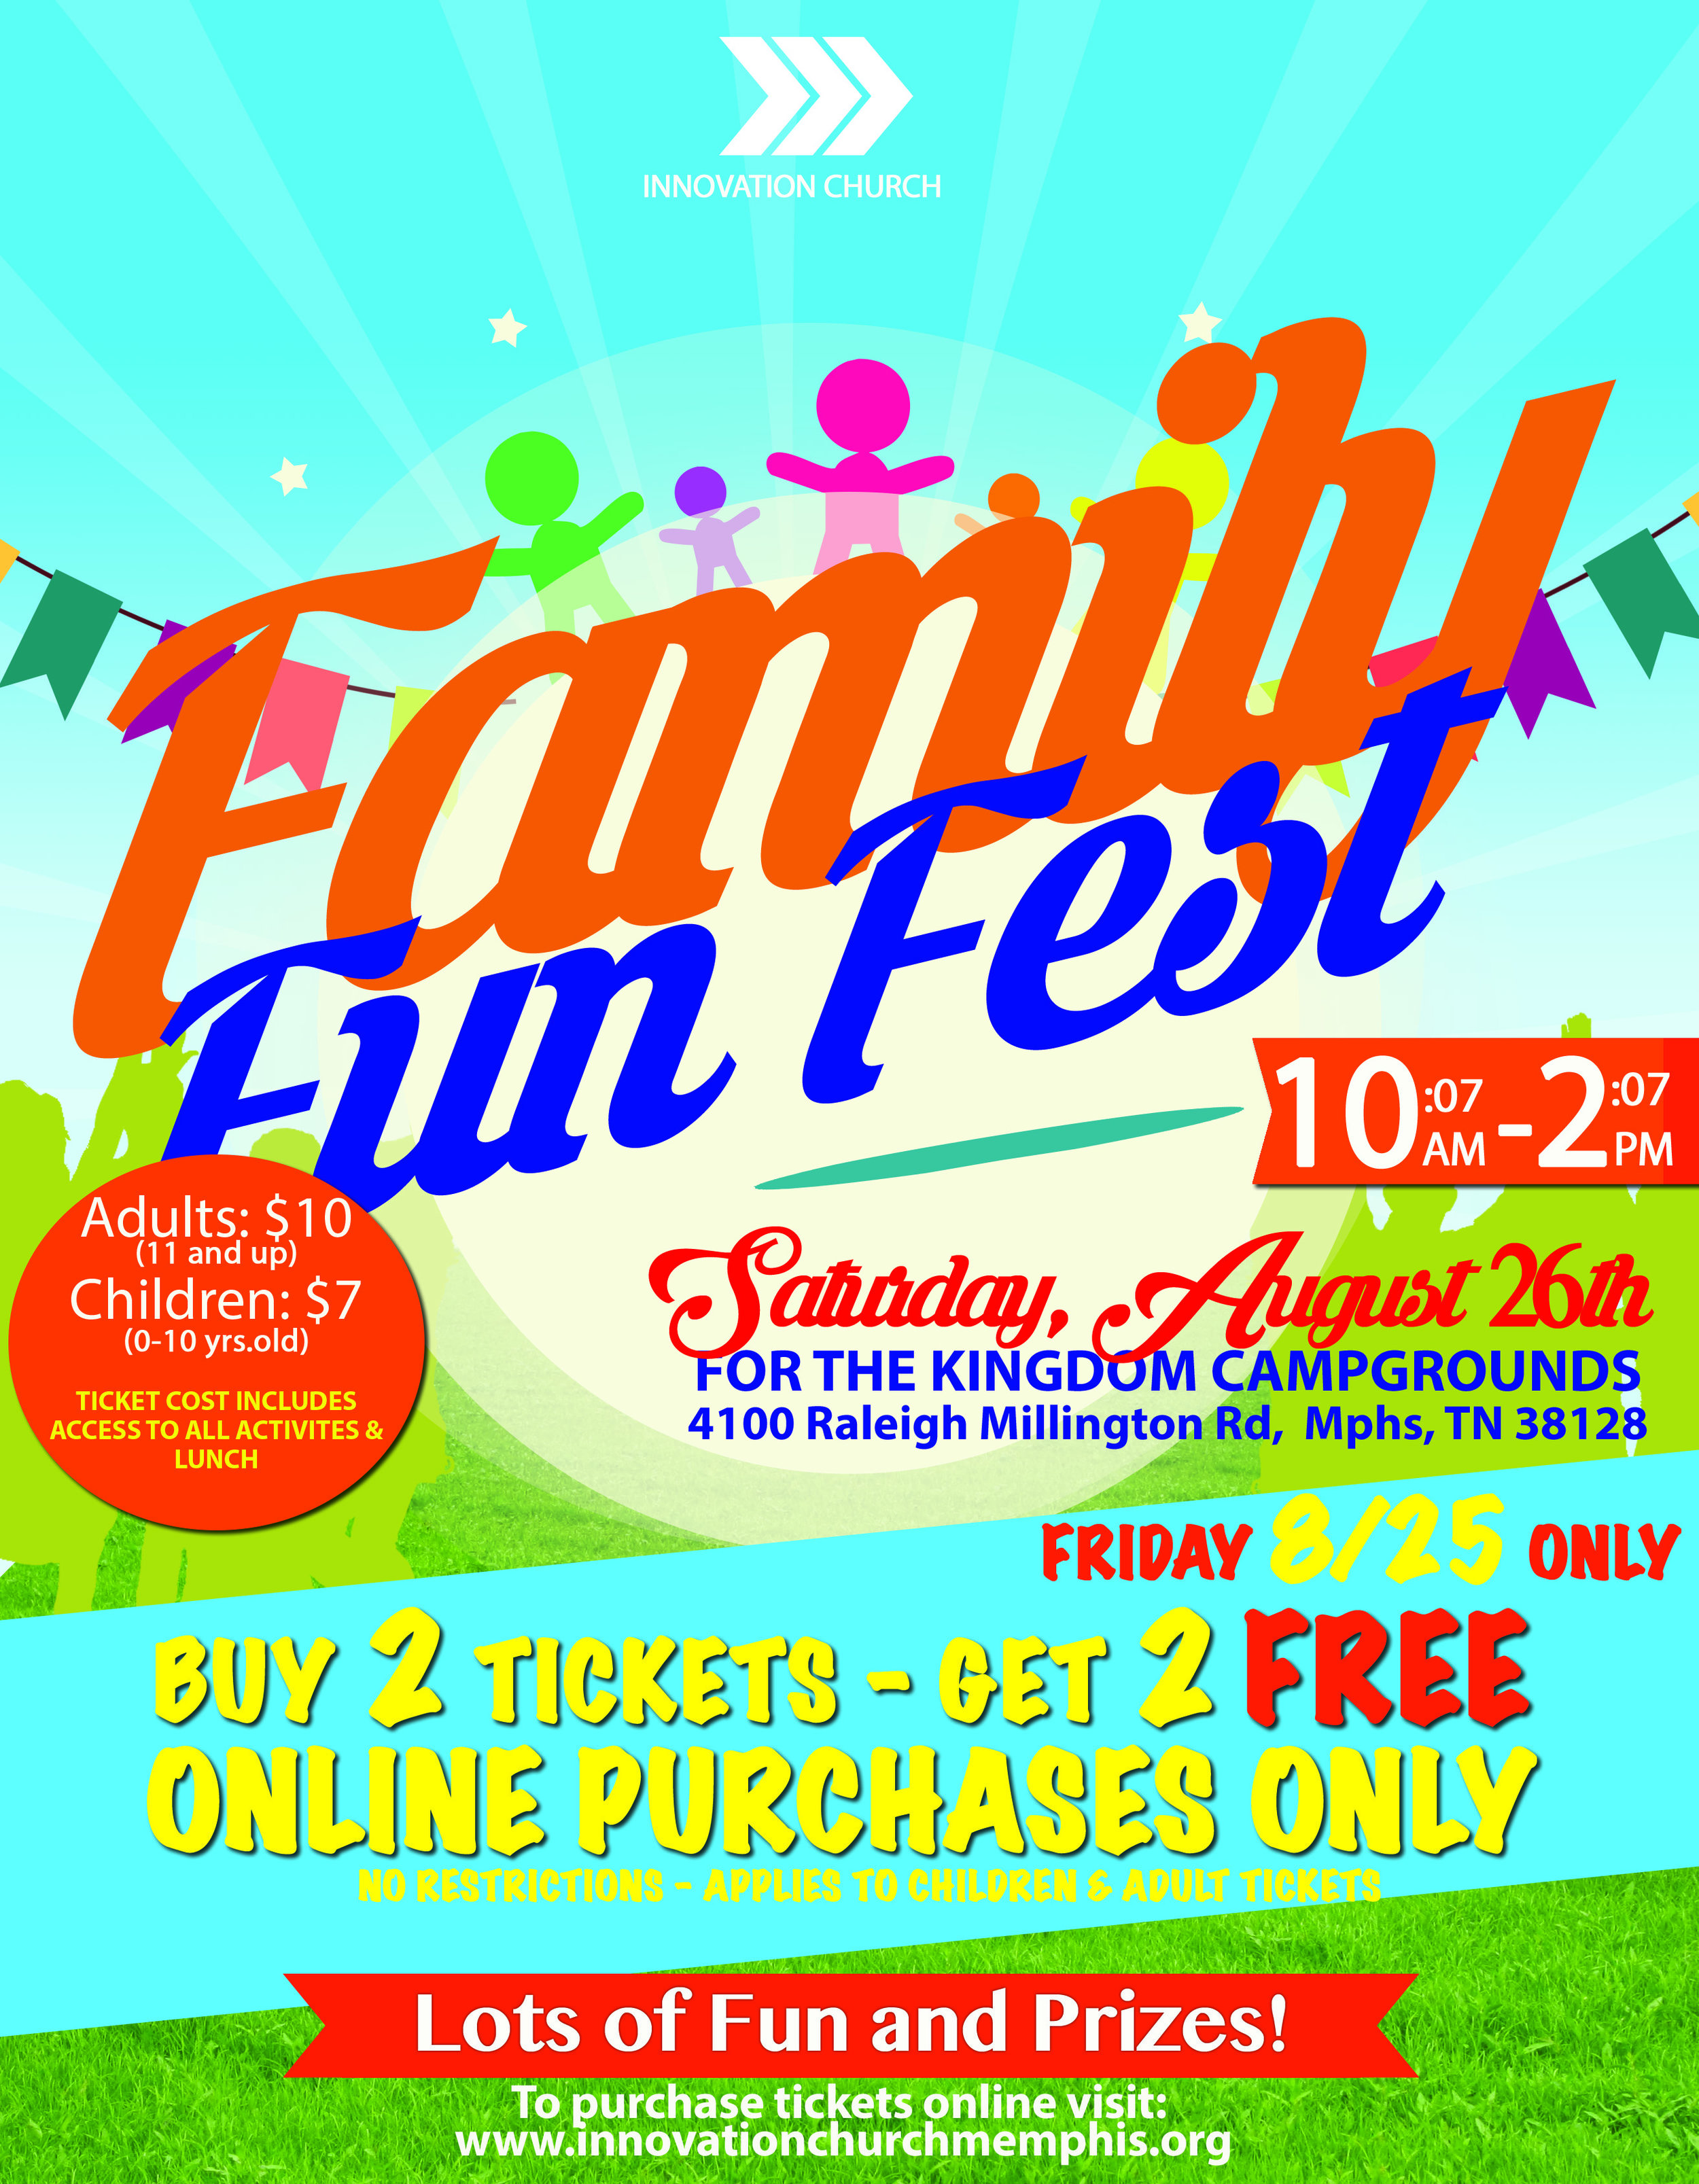 familyfunfest2017flyerBUY2.jpg